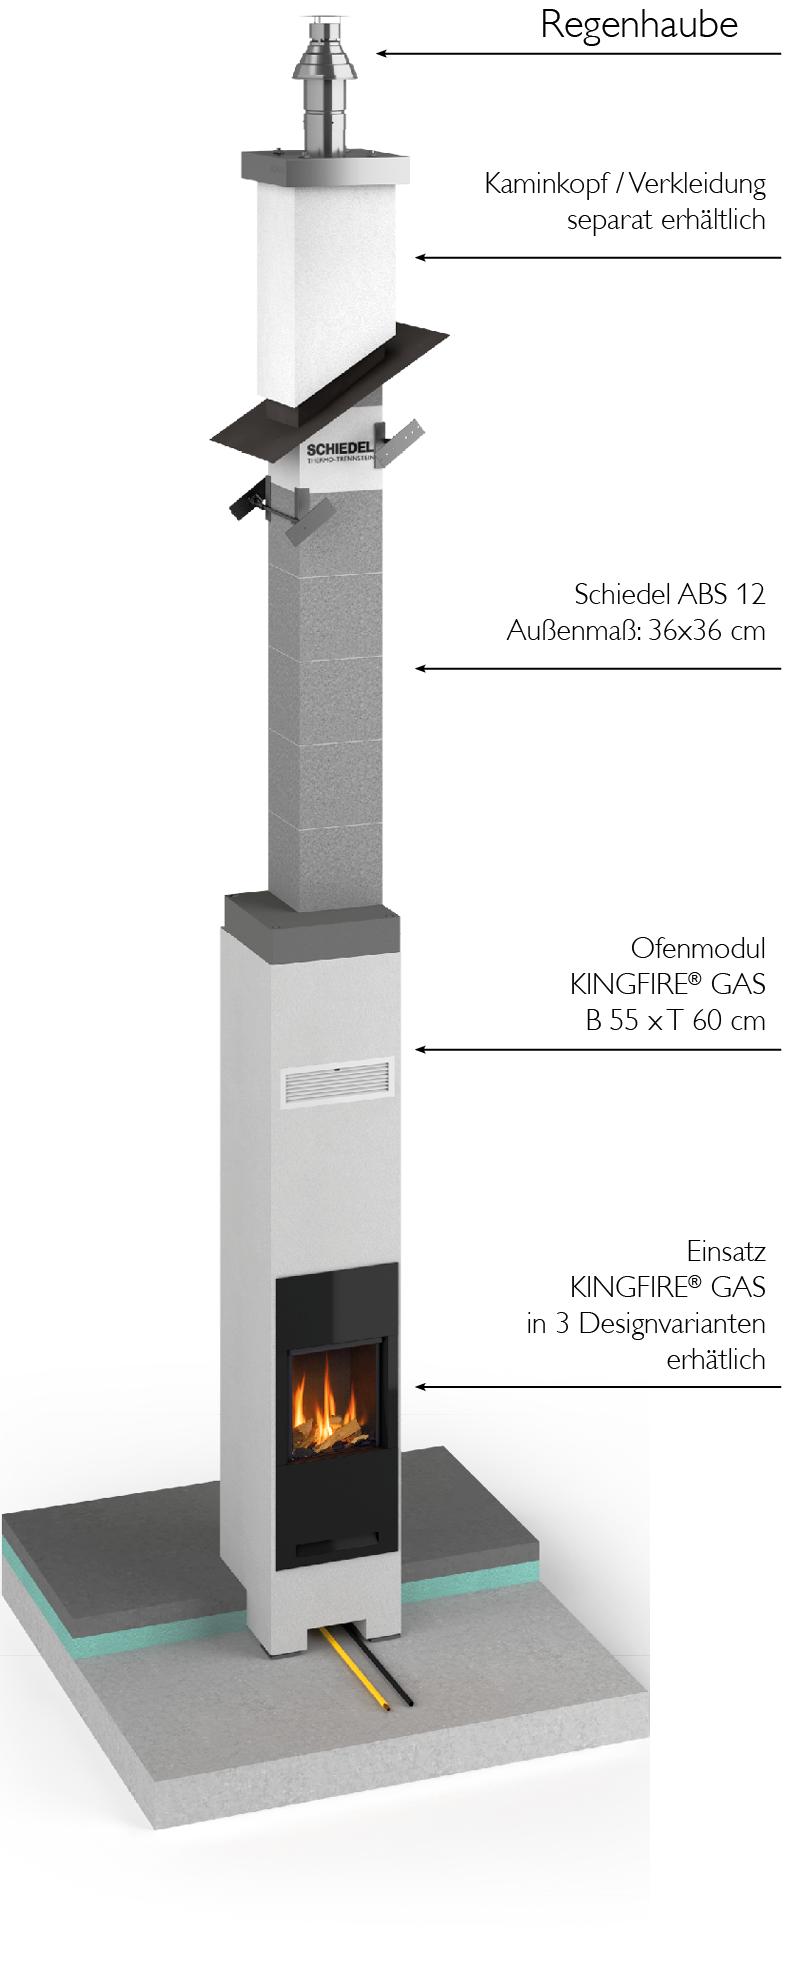 Systemaufbau KINGFIRE Gas